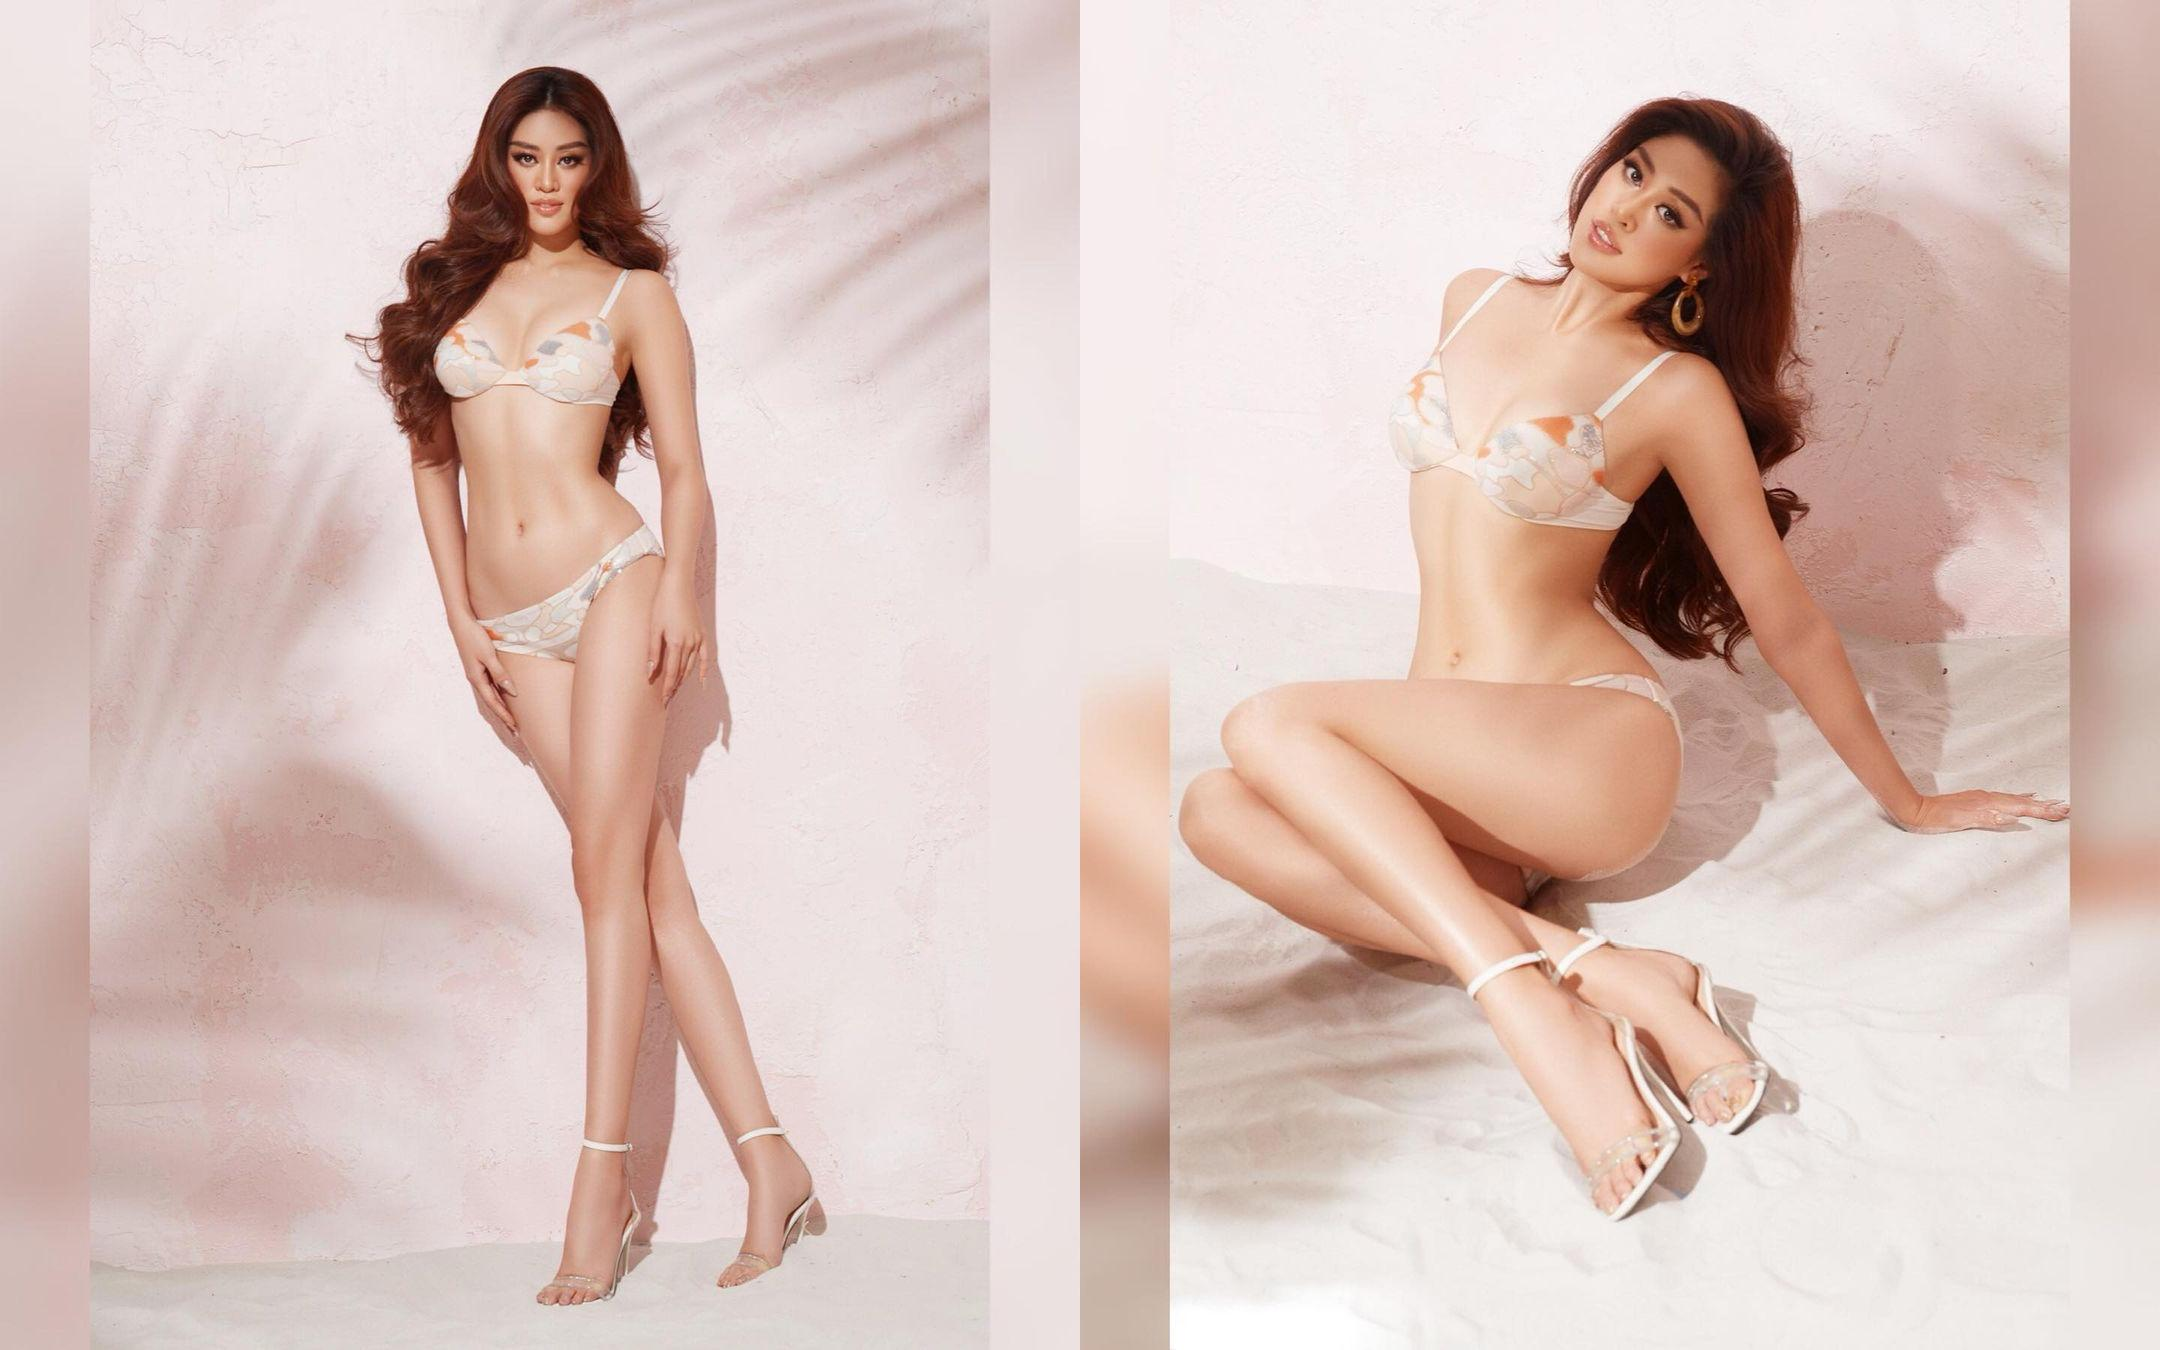 miss vietnam de bikini. 206457529_182678287_282909853474966_1951962741523820419_n-jpg-tp-1-_nc_ht-scontent-gig2-1